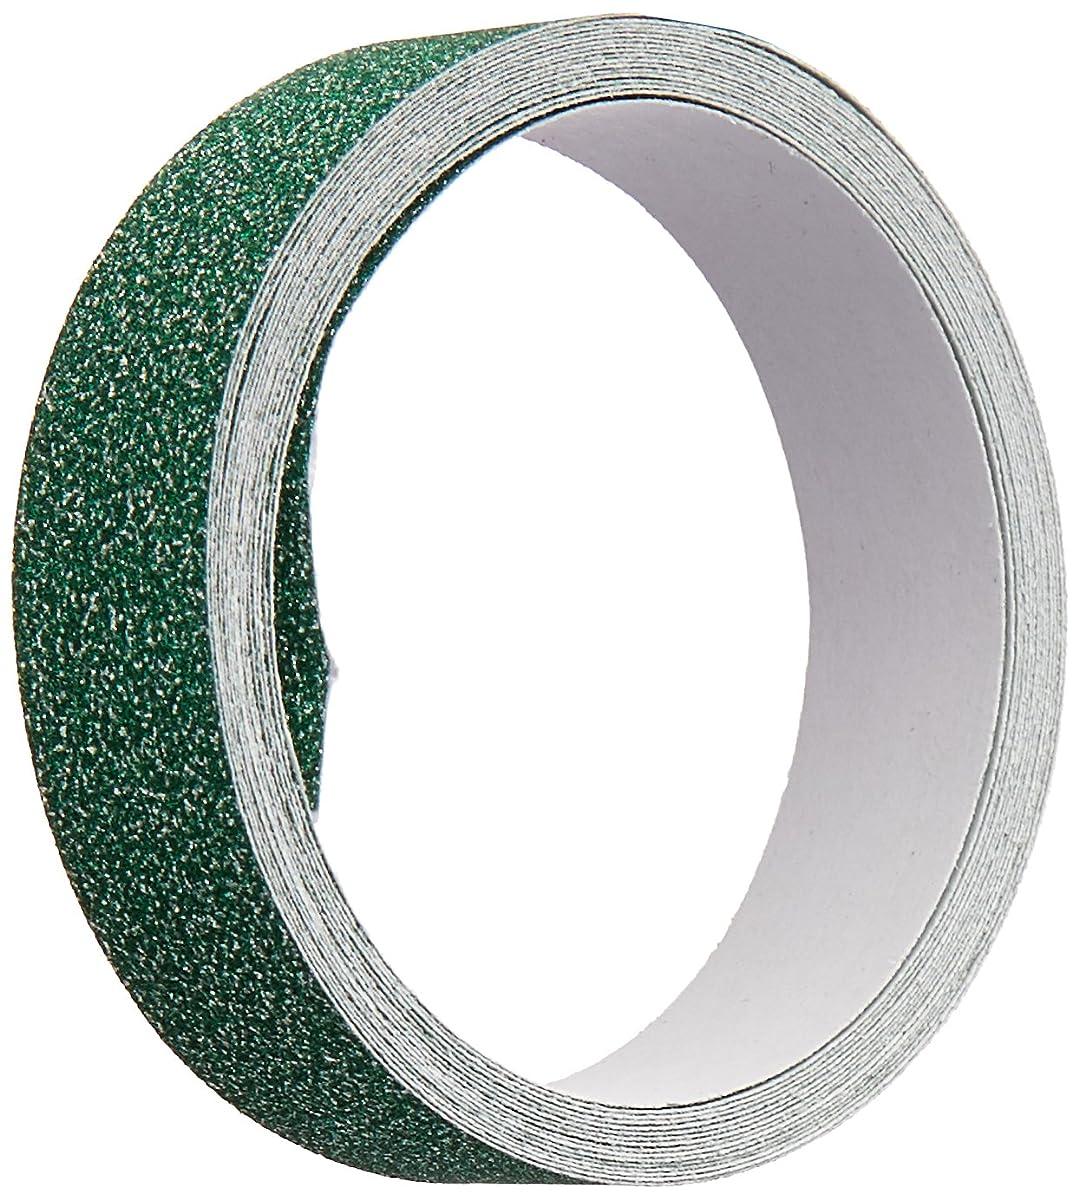 DARICE 121720 3-Yard Sparkle Tape, 15mm, Green